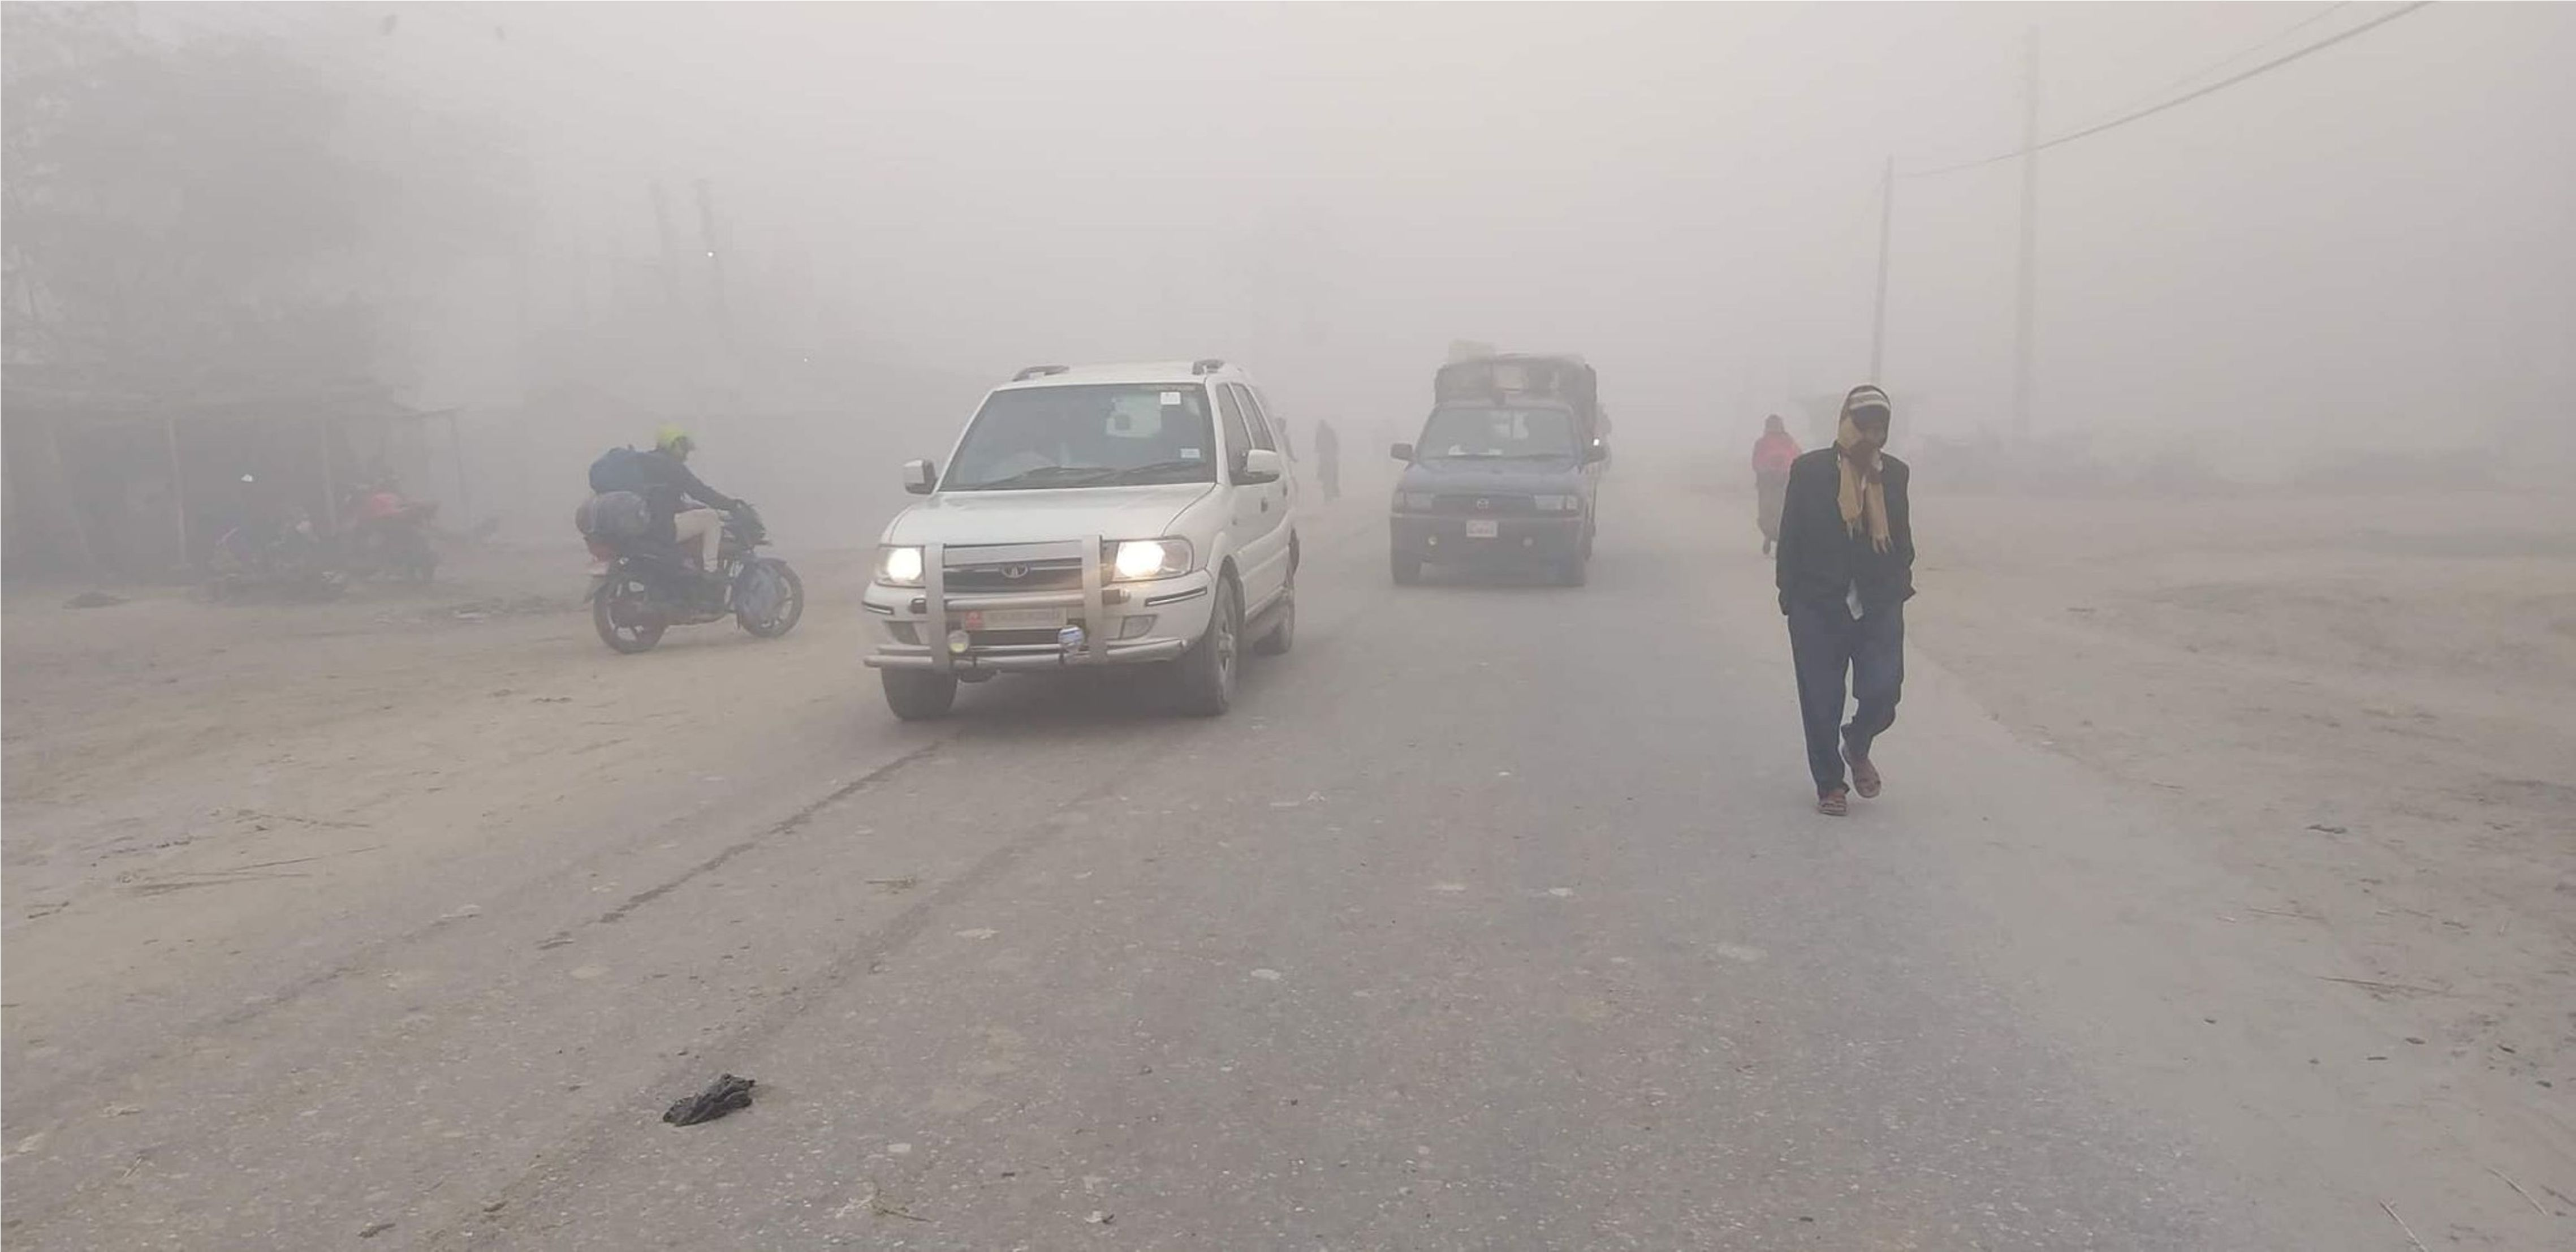 Vehicles plying at Gaur Chandrapur Road Section navigate through a dense fog on Thursday, December 20, 2018. Photo: Prabhat Kumar Jha/THT